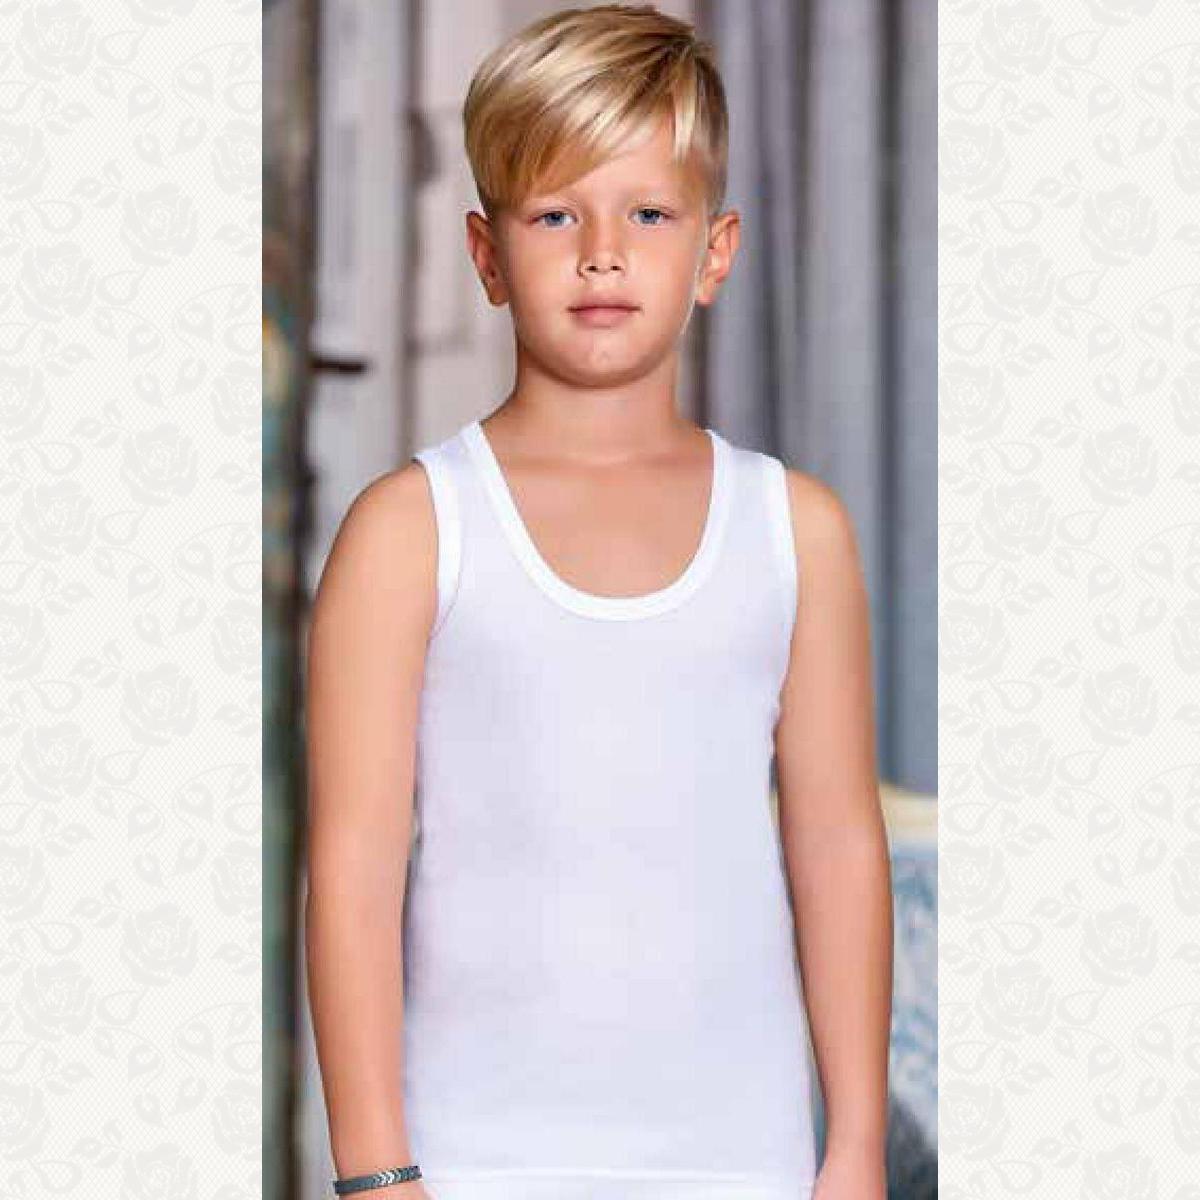 Майка для мальчика размер от 5 до6, цвет белый, 6 шт.